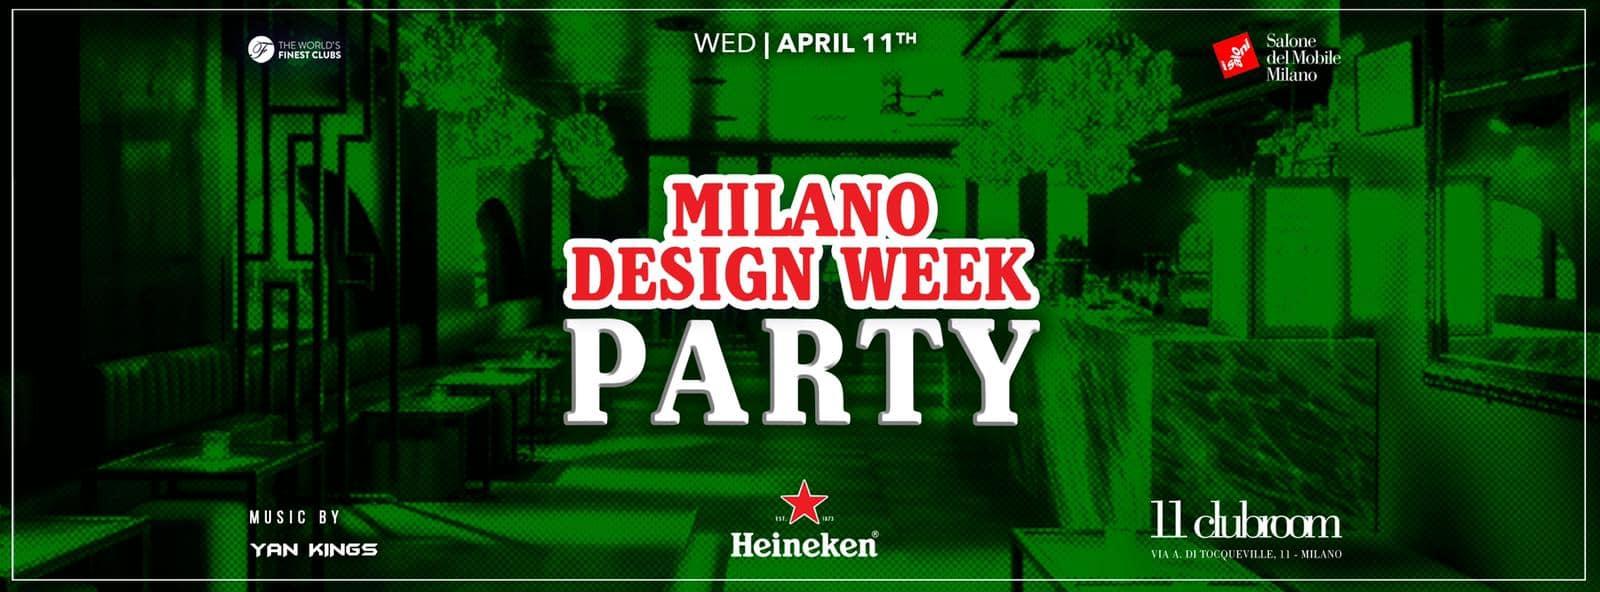 HEINEKEN DESIGN WEEK PARTY